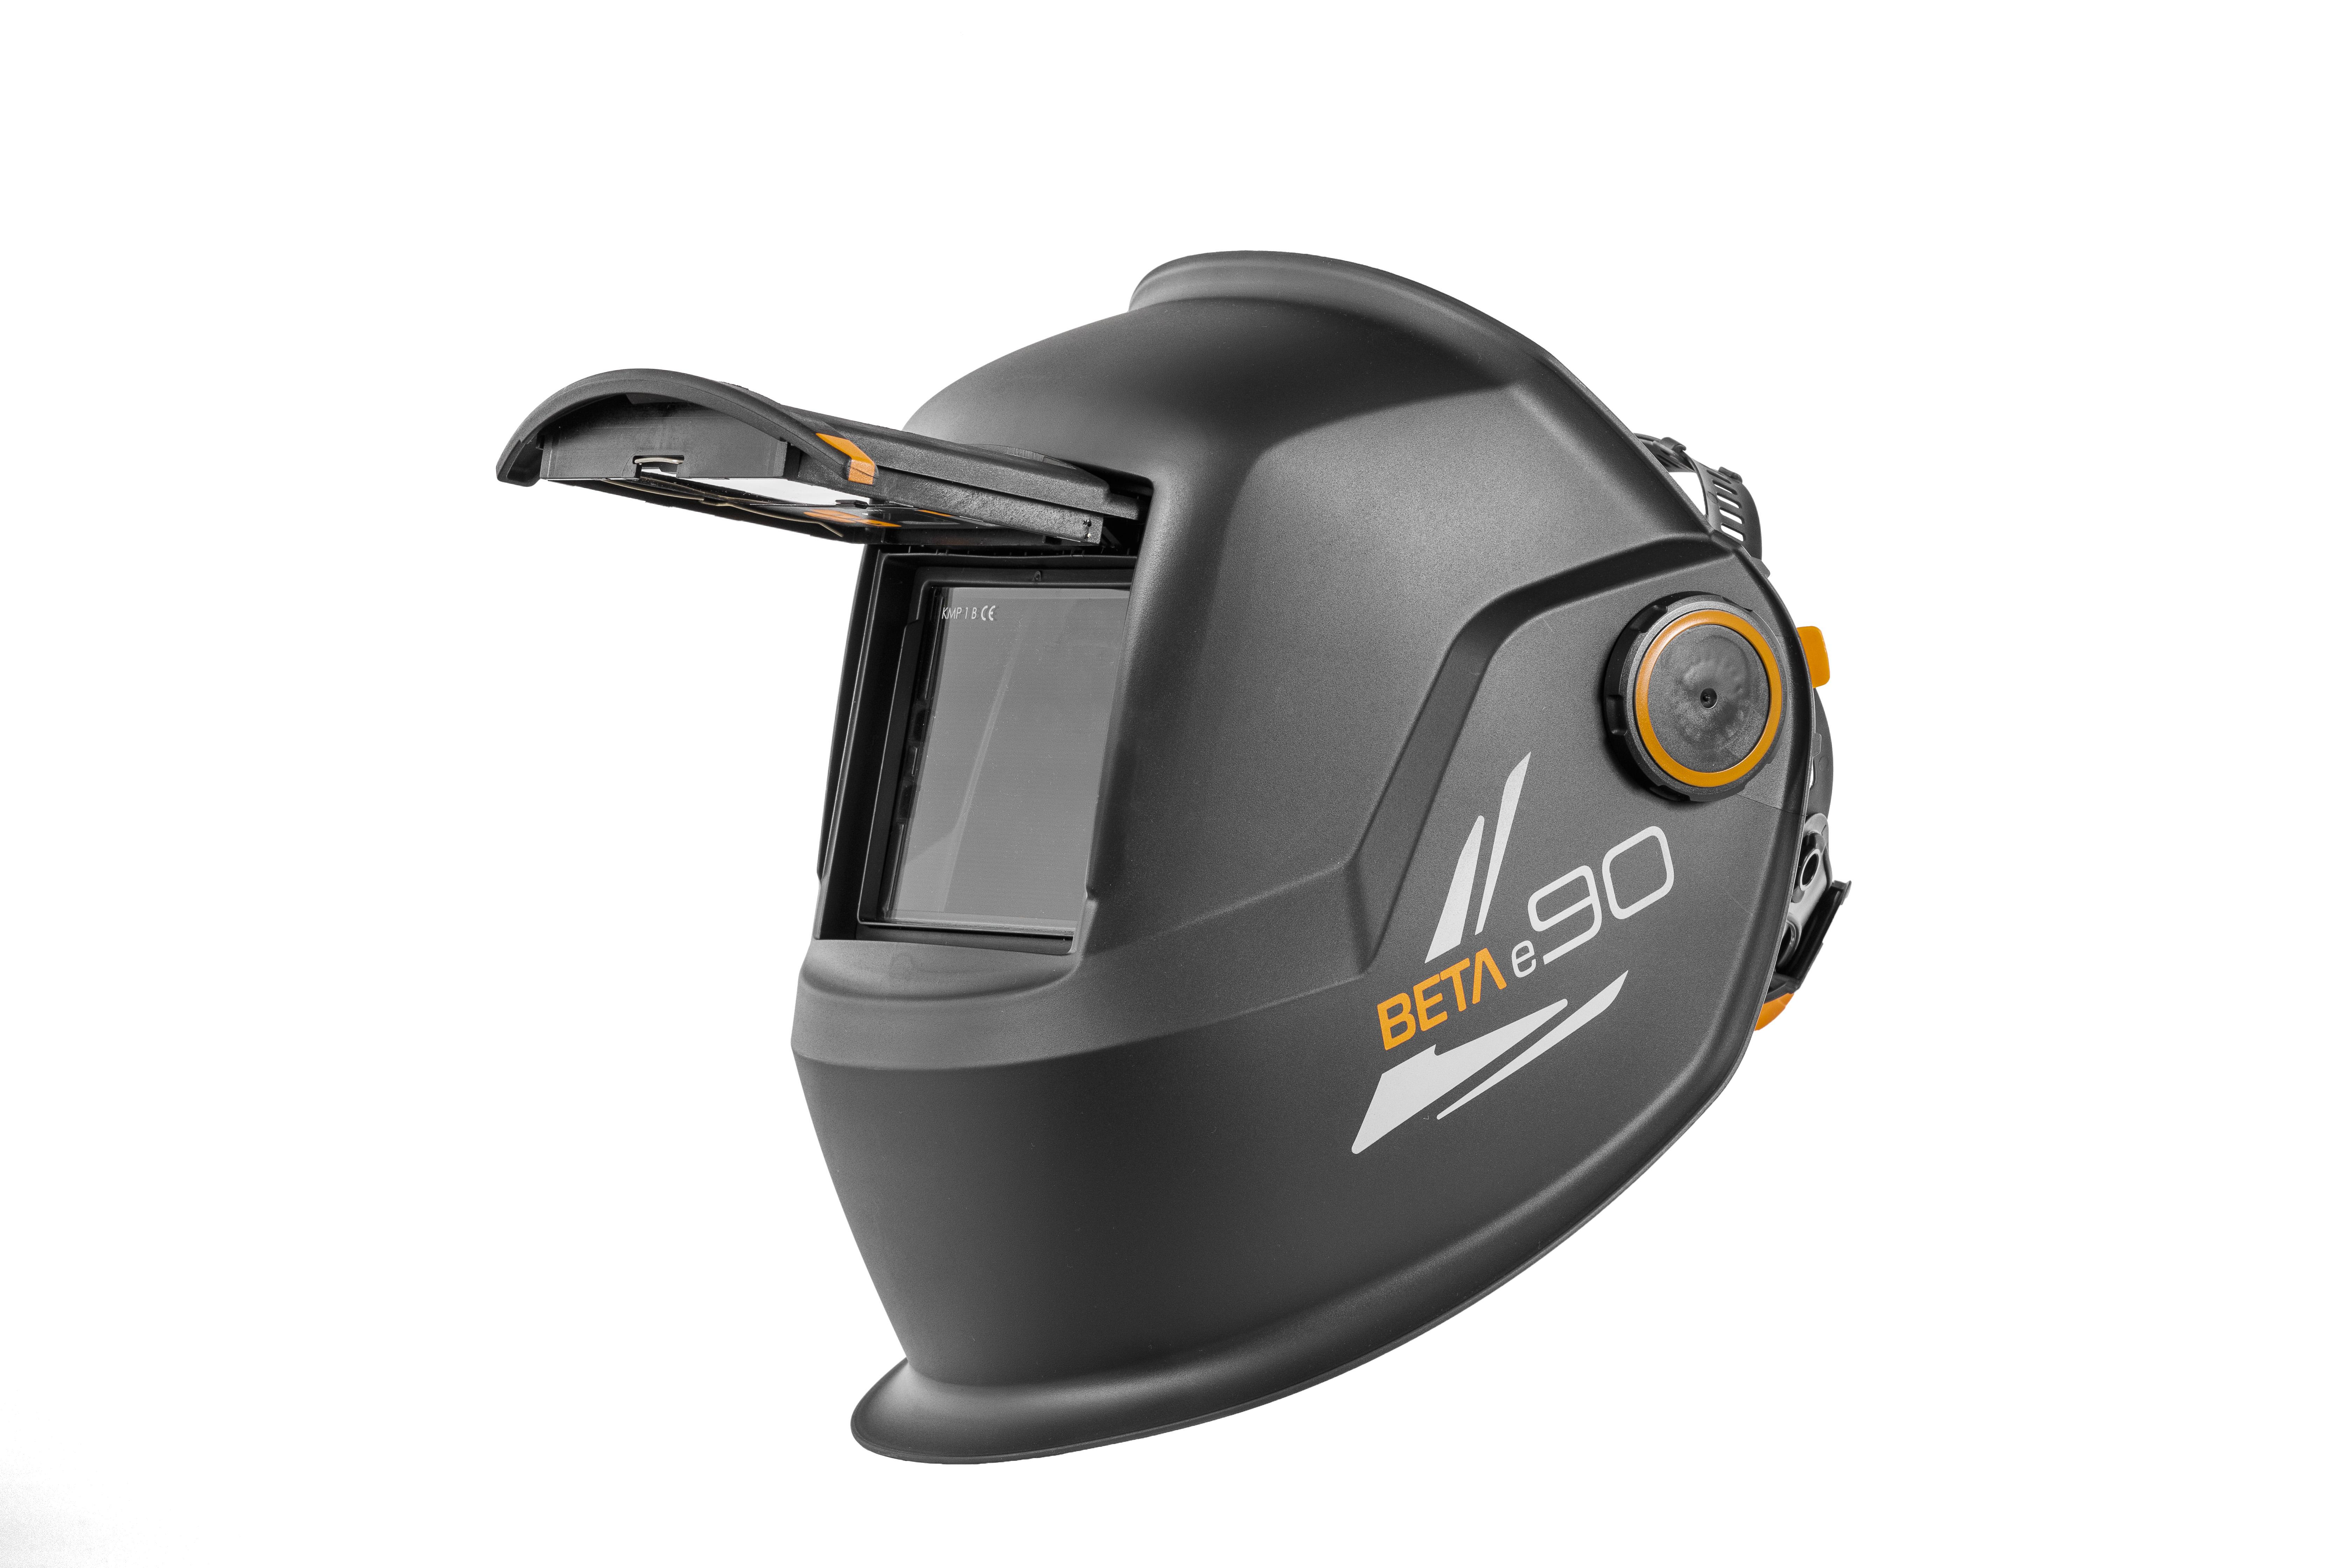 Сварочная маска Kemppi Beta e90x (9873024) сварочная маска kemppi beta e90p 9873022